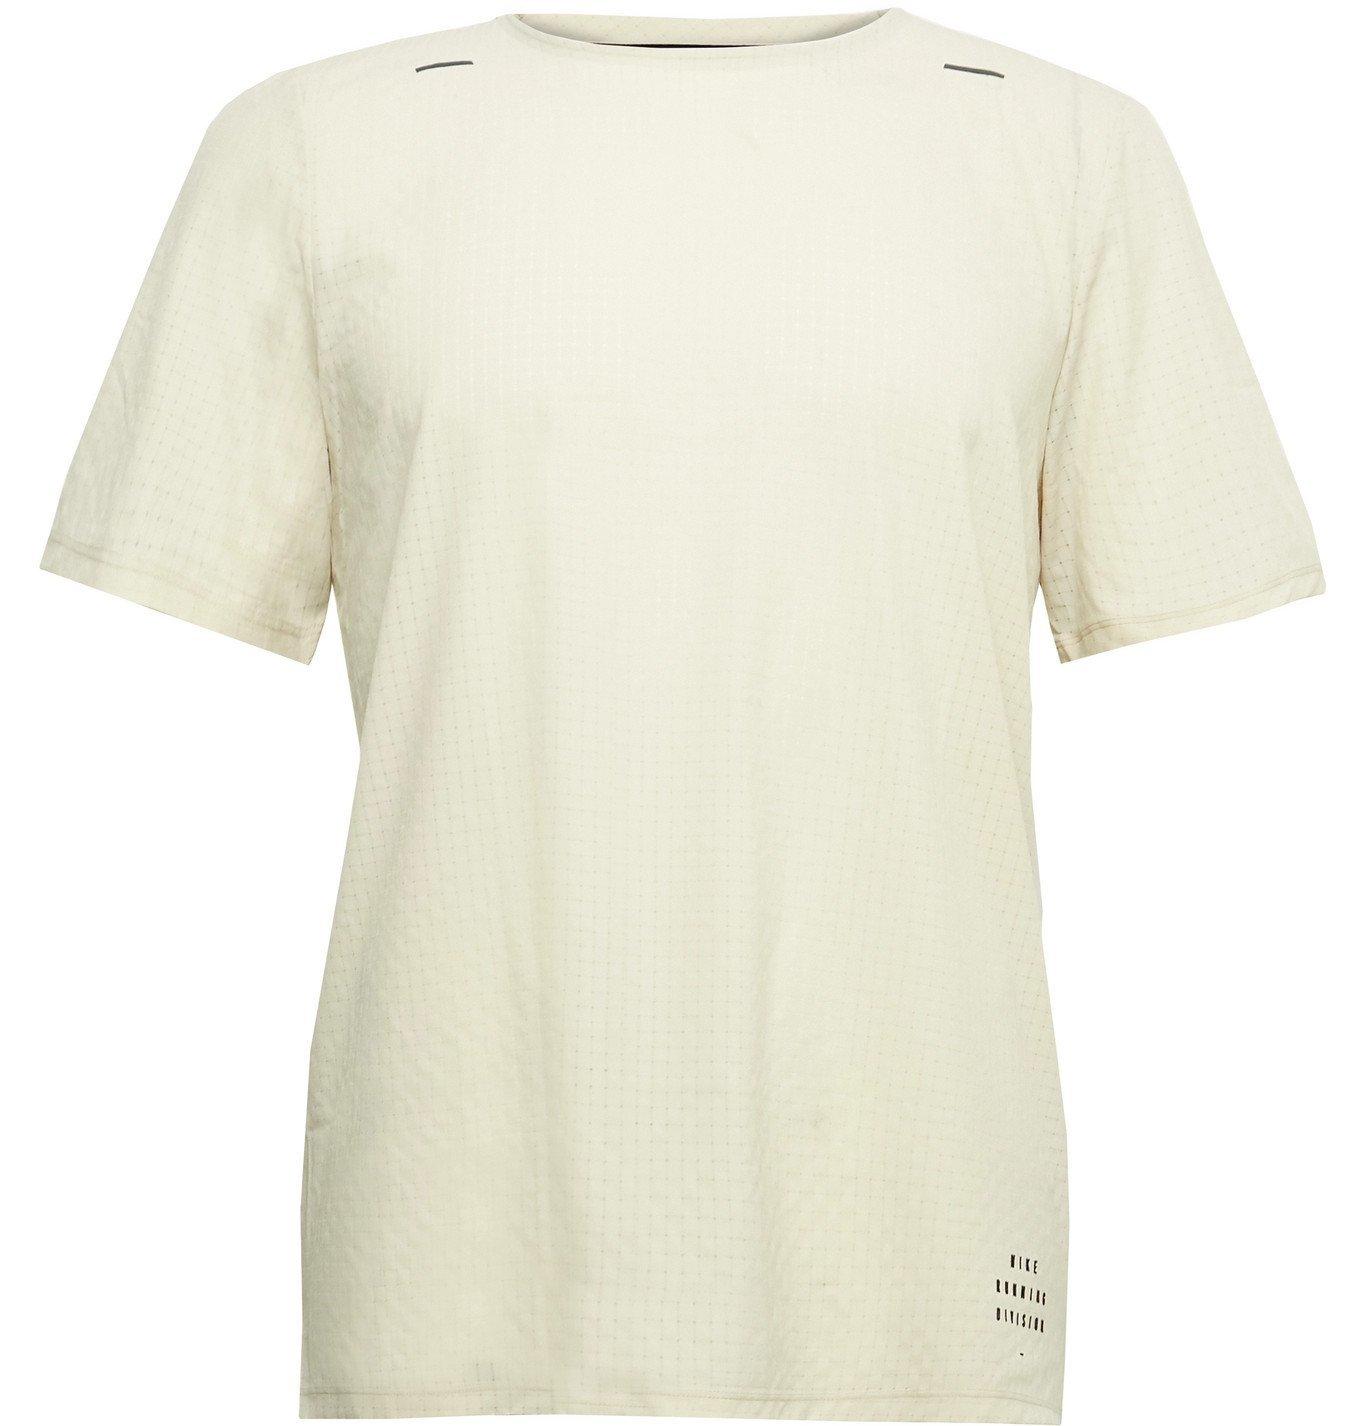 Nike Running - Slim-Fit Division Adapt Perforated Dri-Fit Mesh T-Shirt - Neutrals